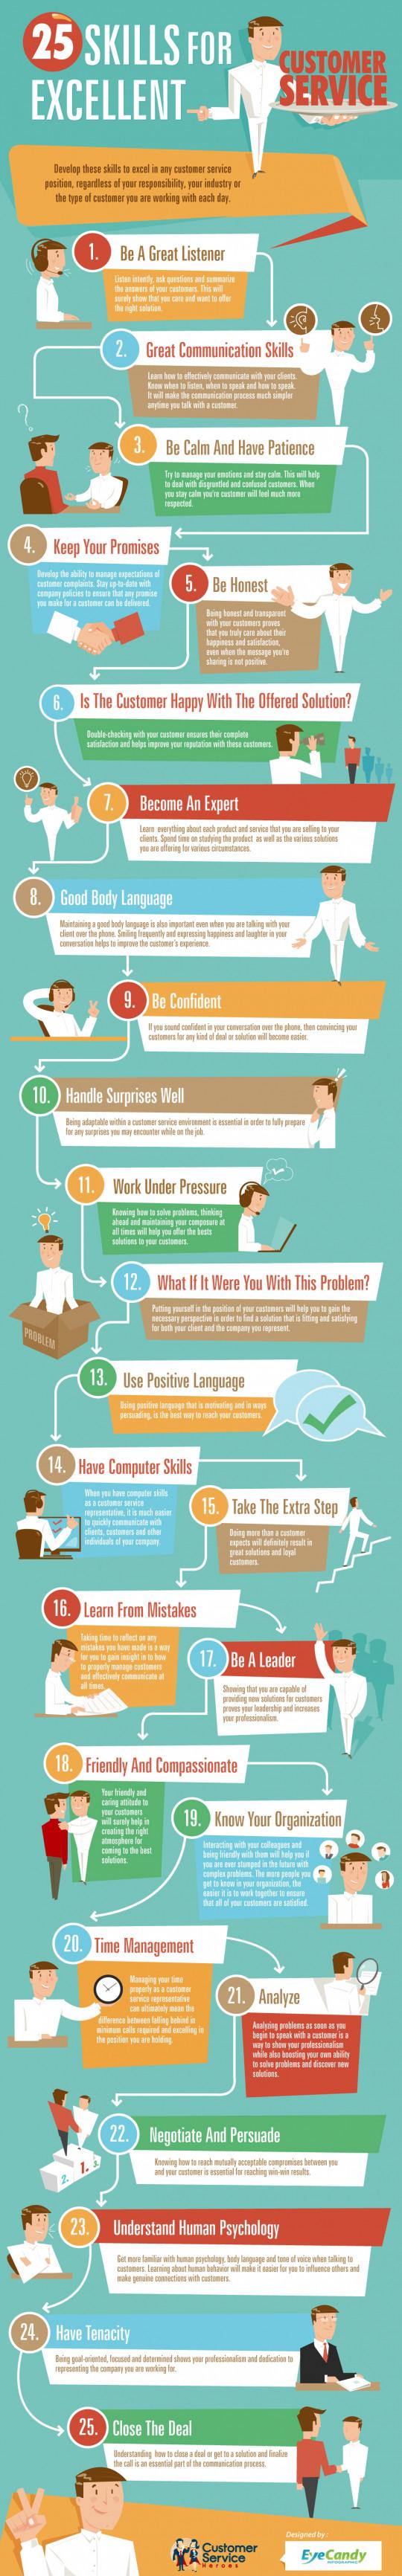 25 Skills for Excellent Customer Service